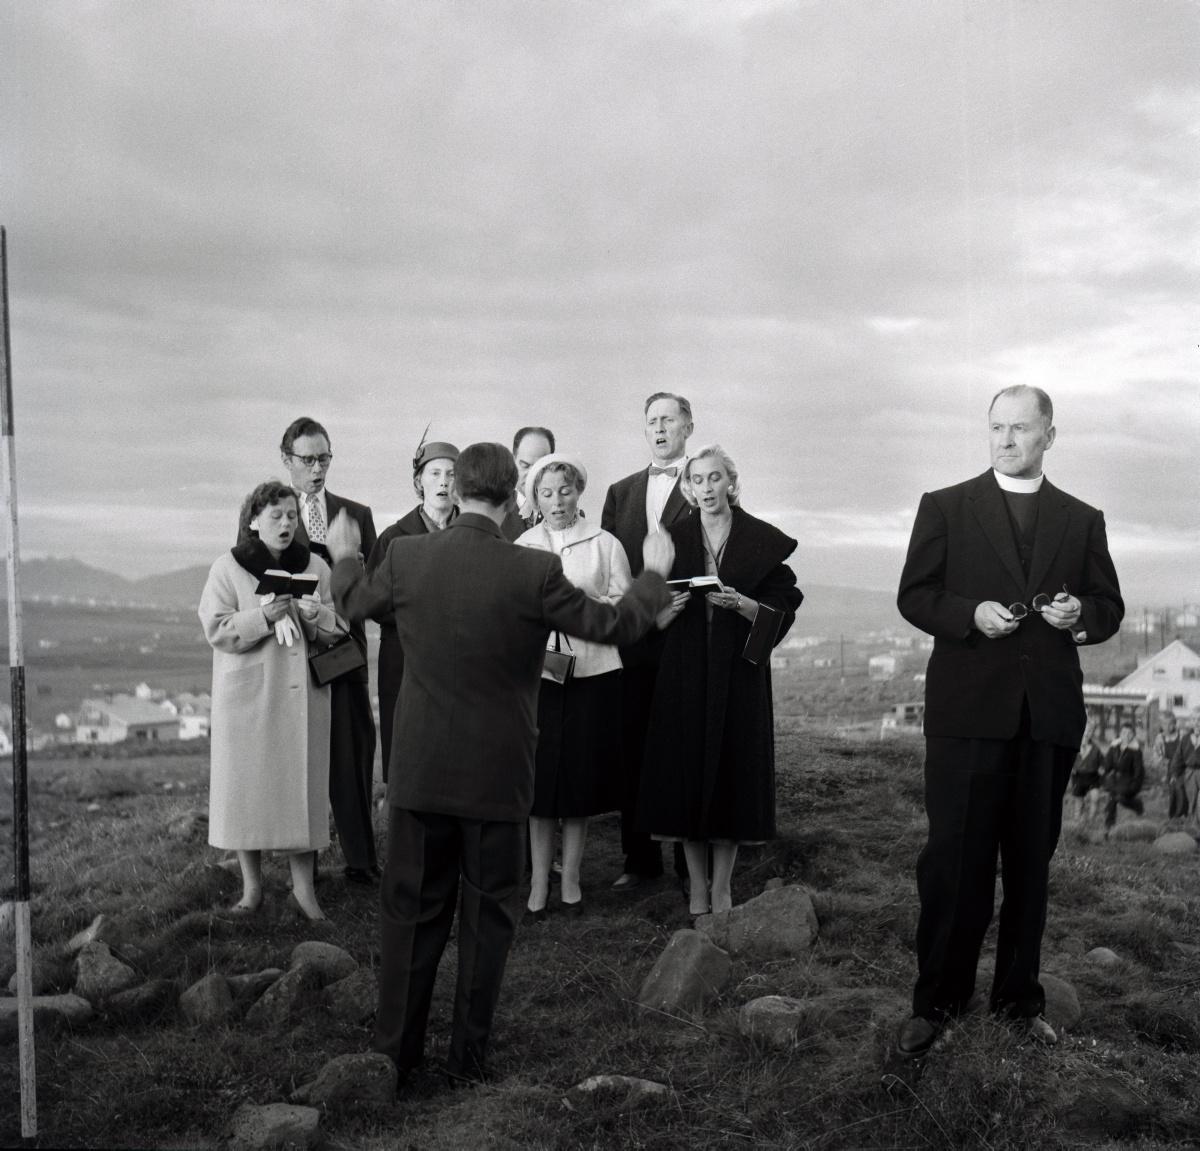 Sigurhans Vignir (1894-1975) Ground-breaking ceremony for Kópavogur Church, 1958.